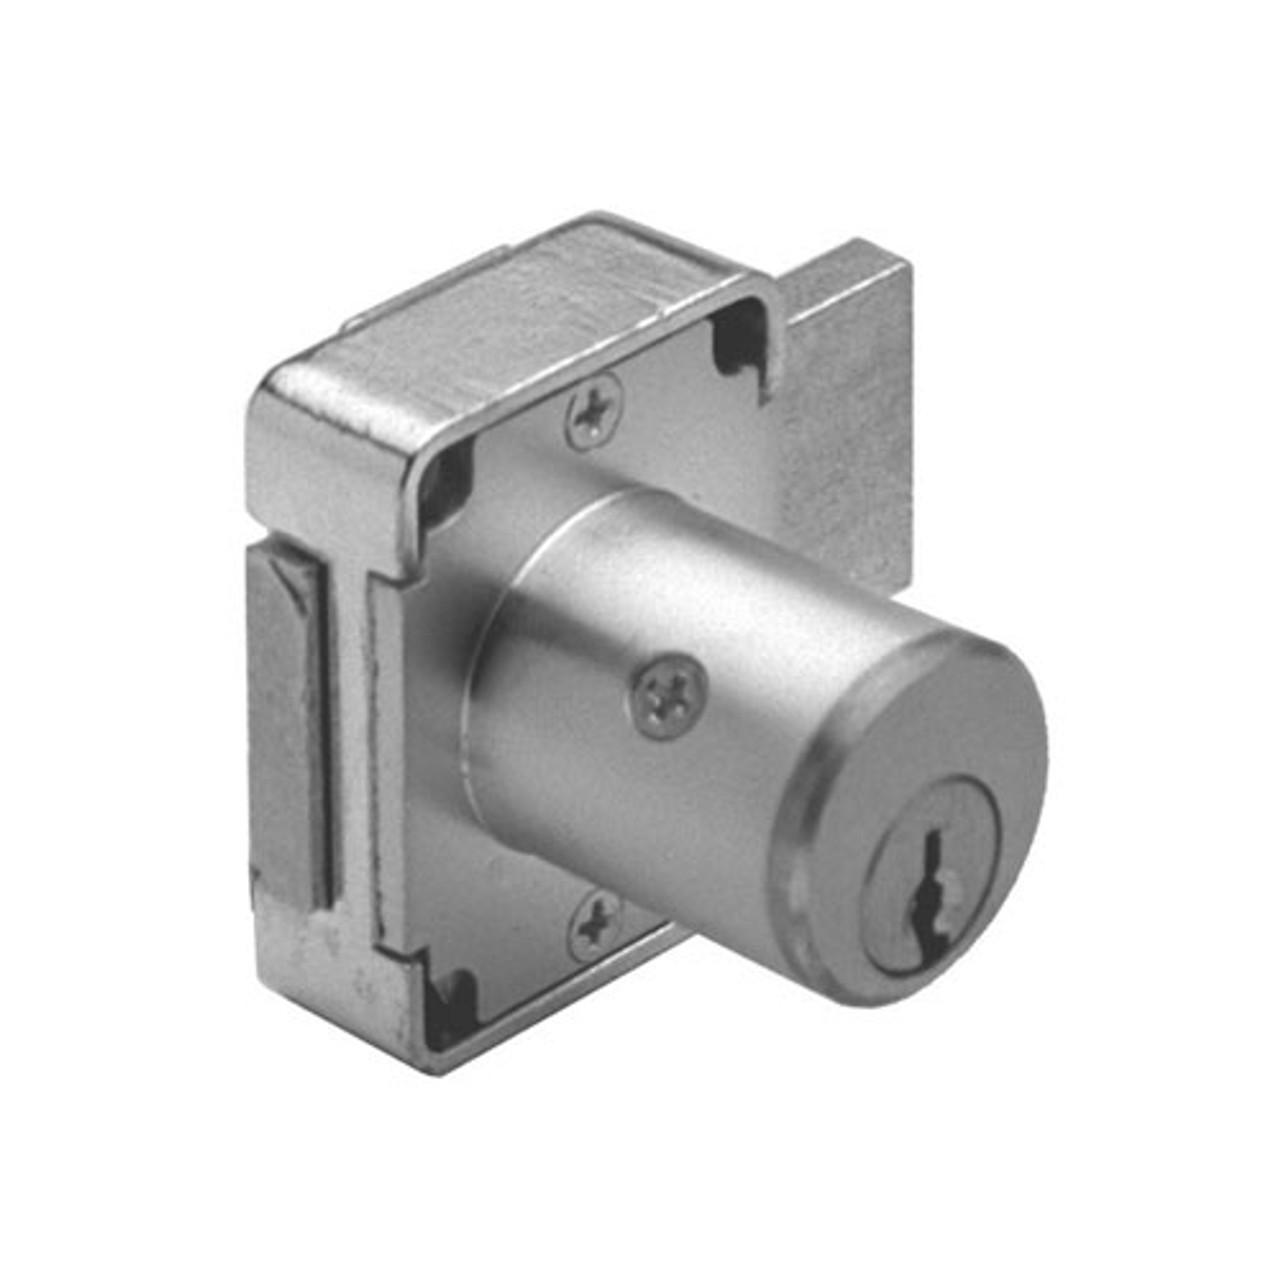 Olympus 100DR-KA107-26D-1-3/8 Deadbolt Locks in Satin Chrome Finish